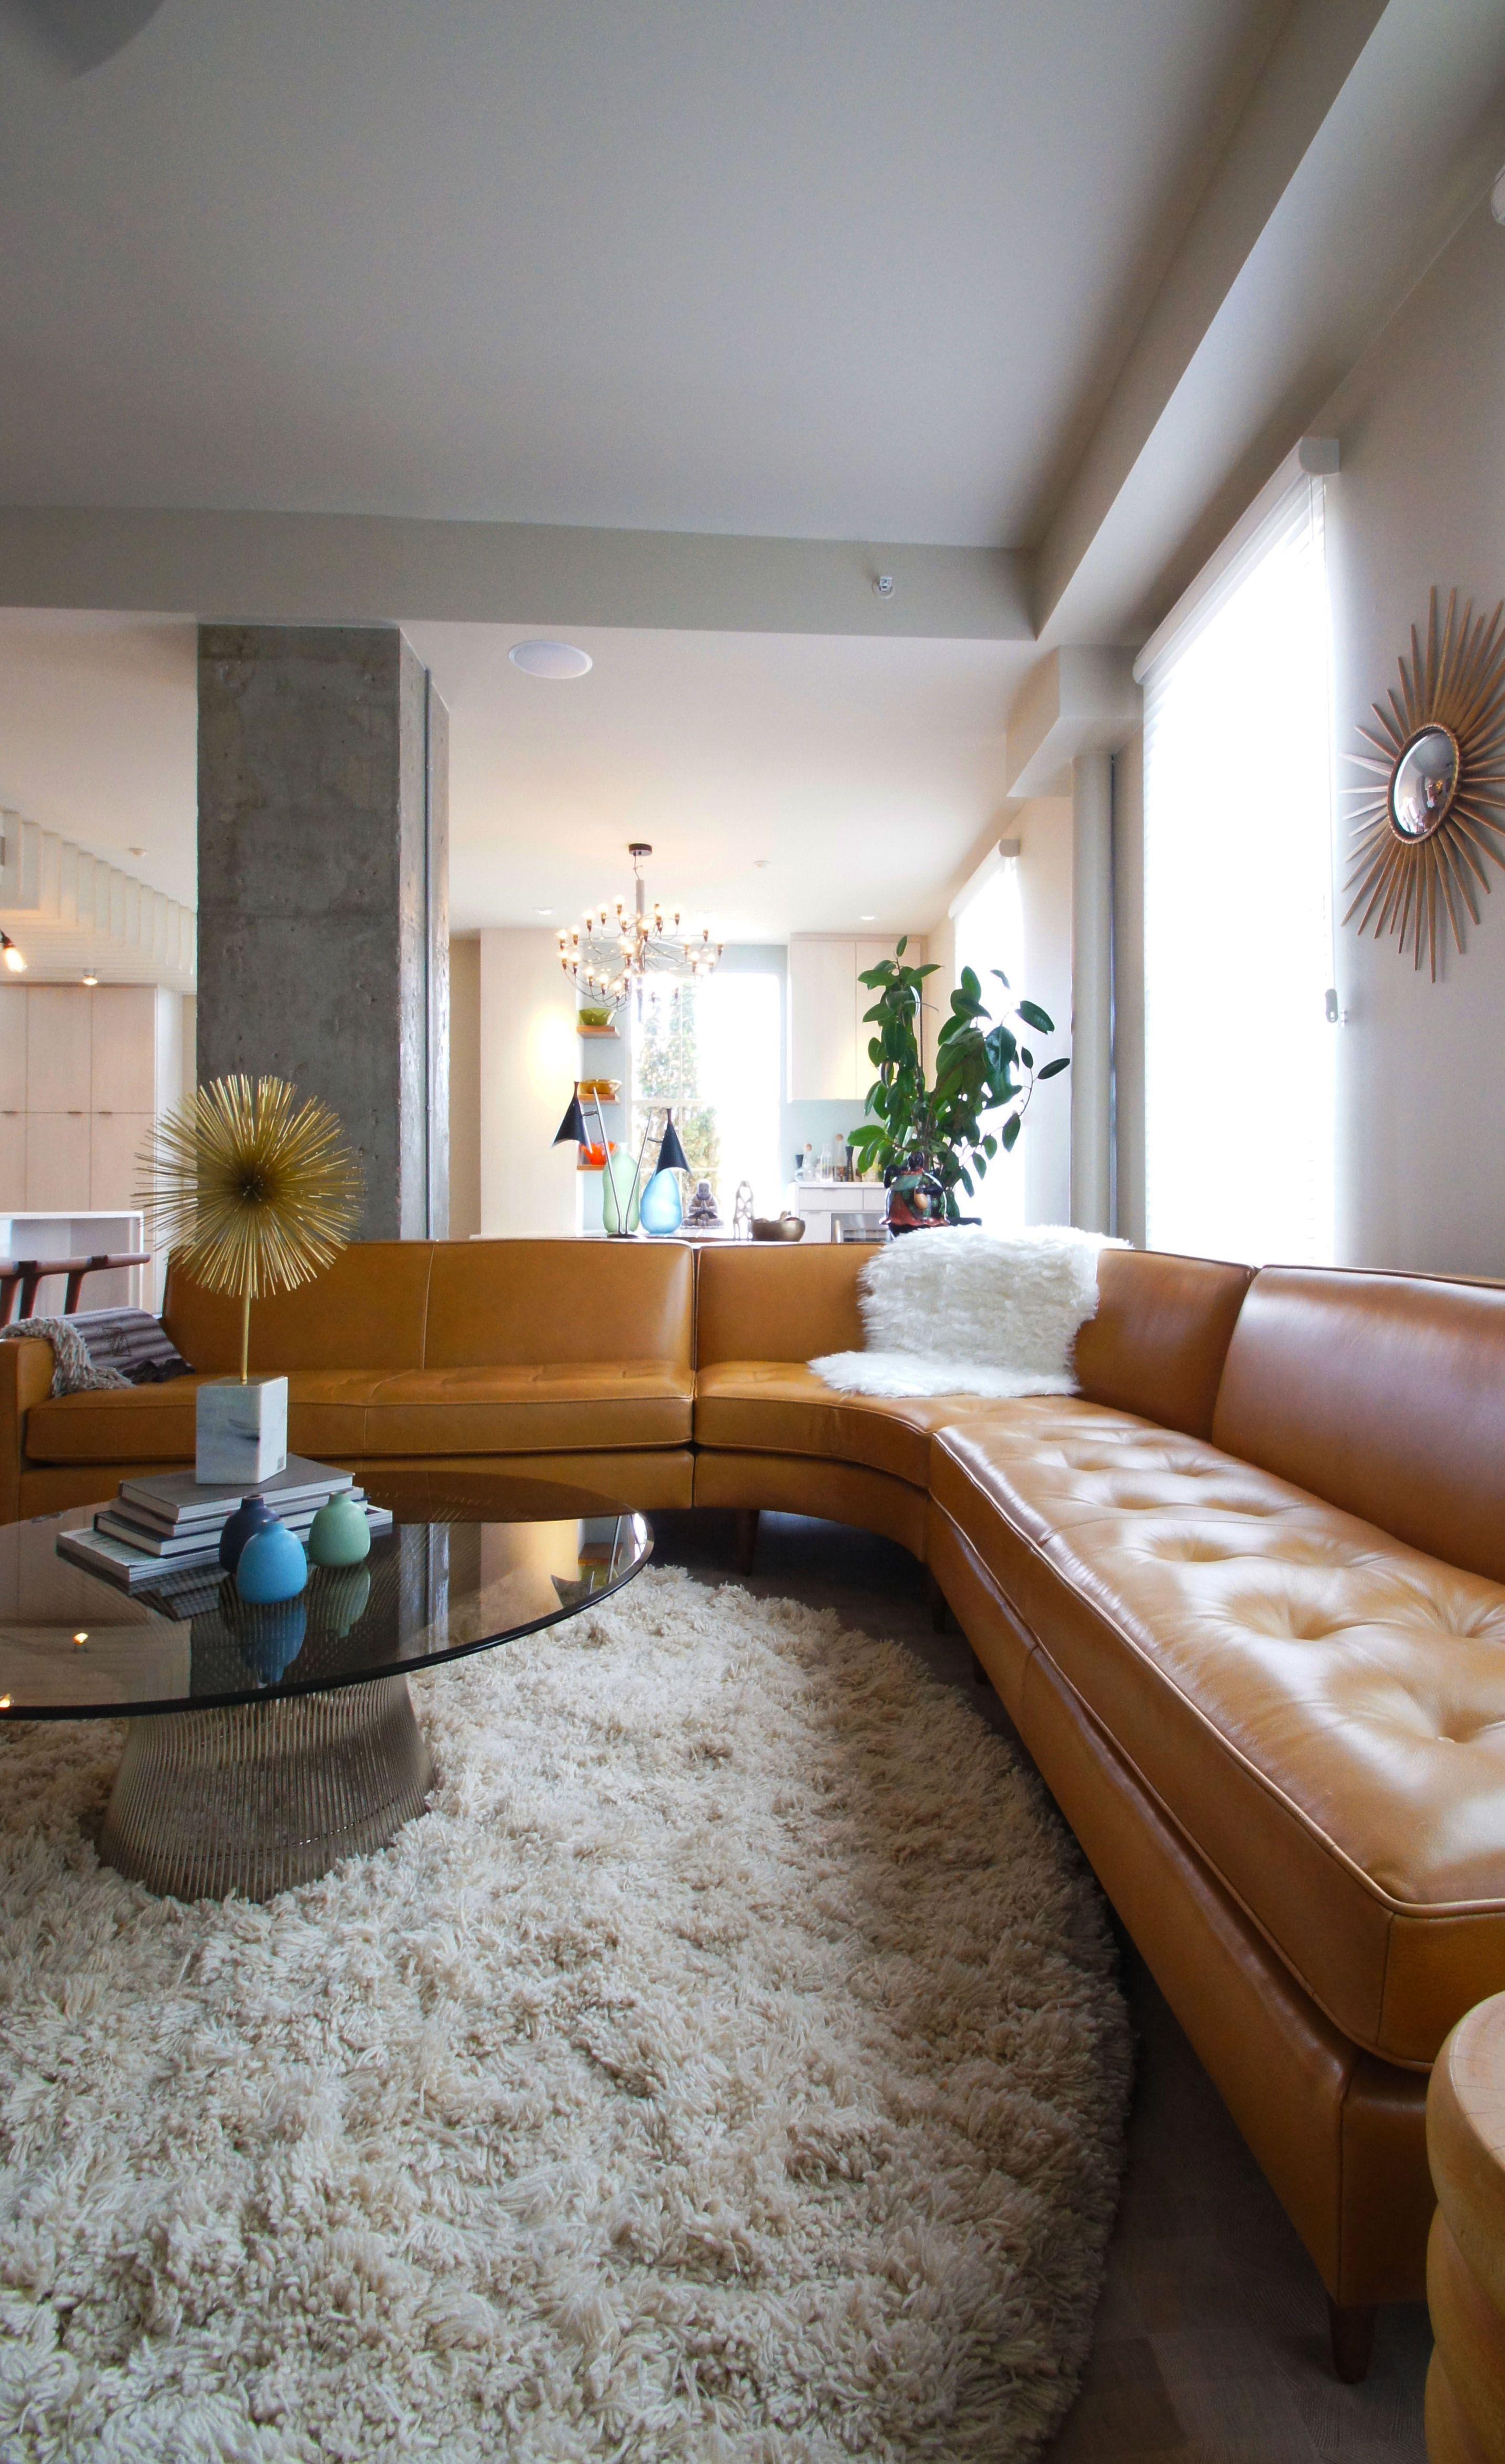 475w Mid Century Furniture Mid Century Modern Sectional Mid Century Modern Coffee Table Mid Century Modern Room